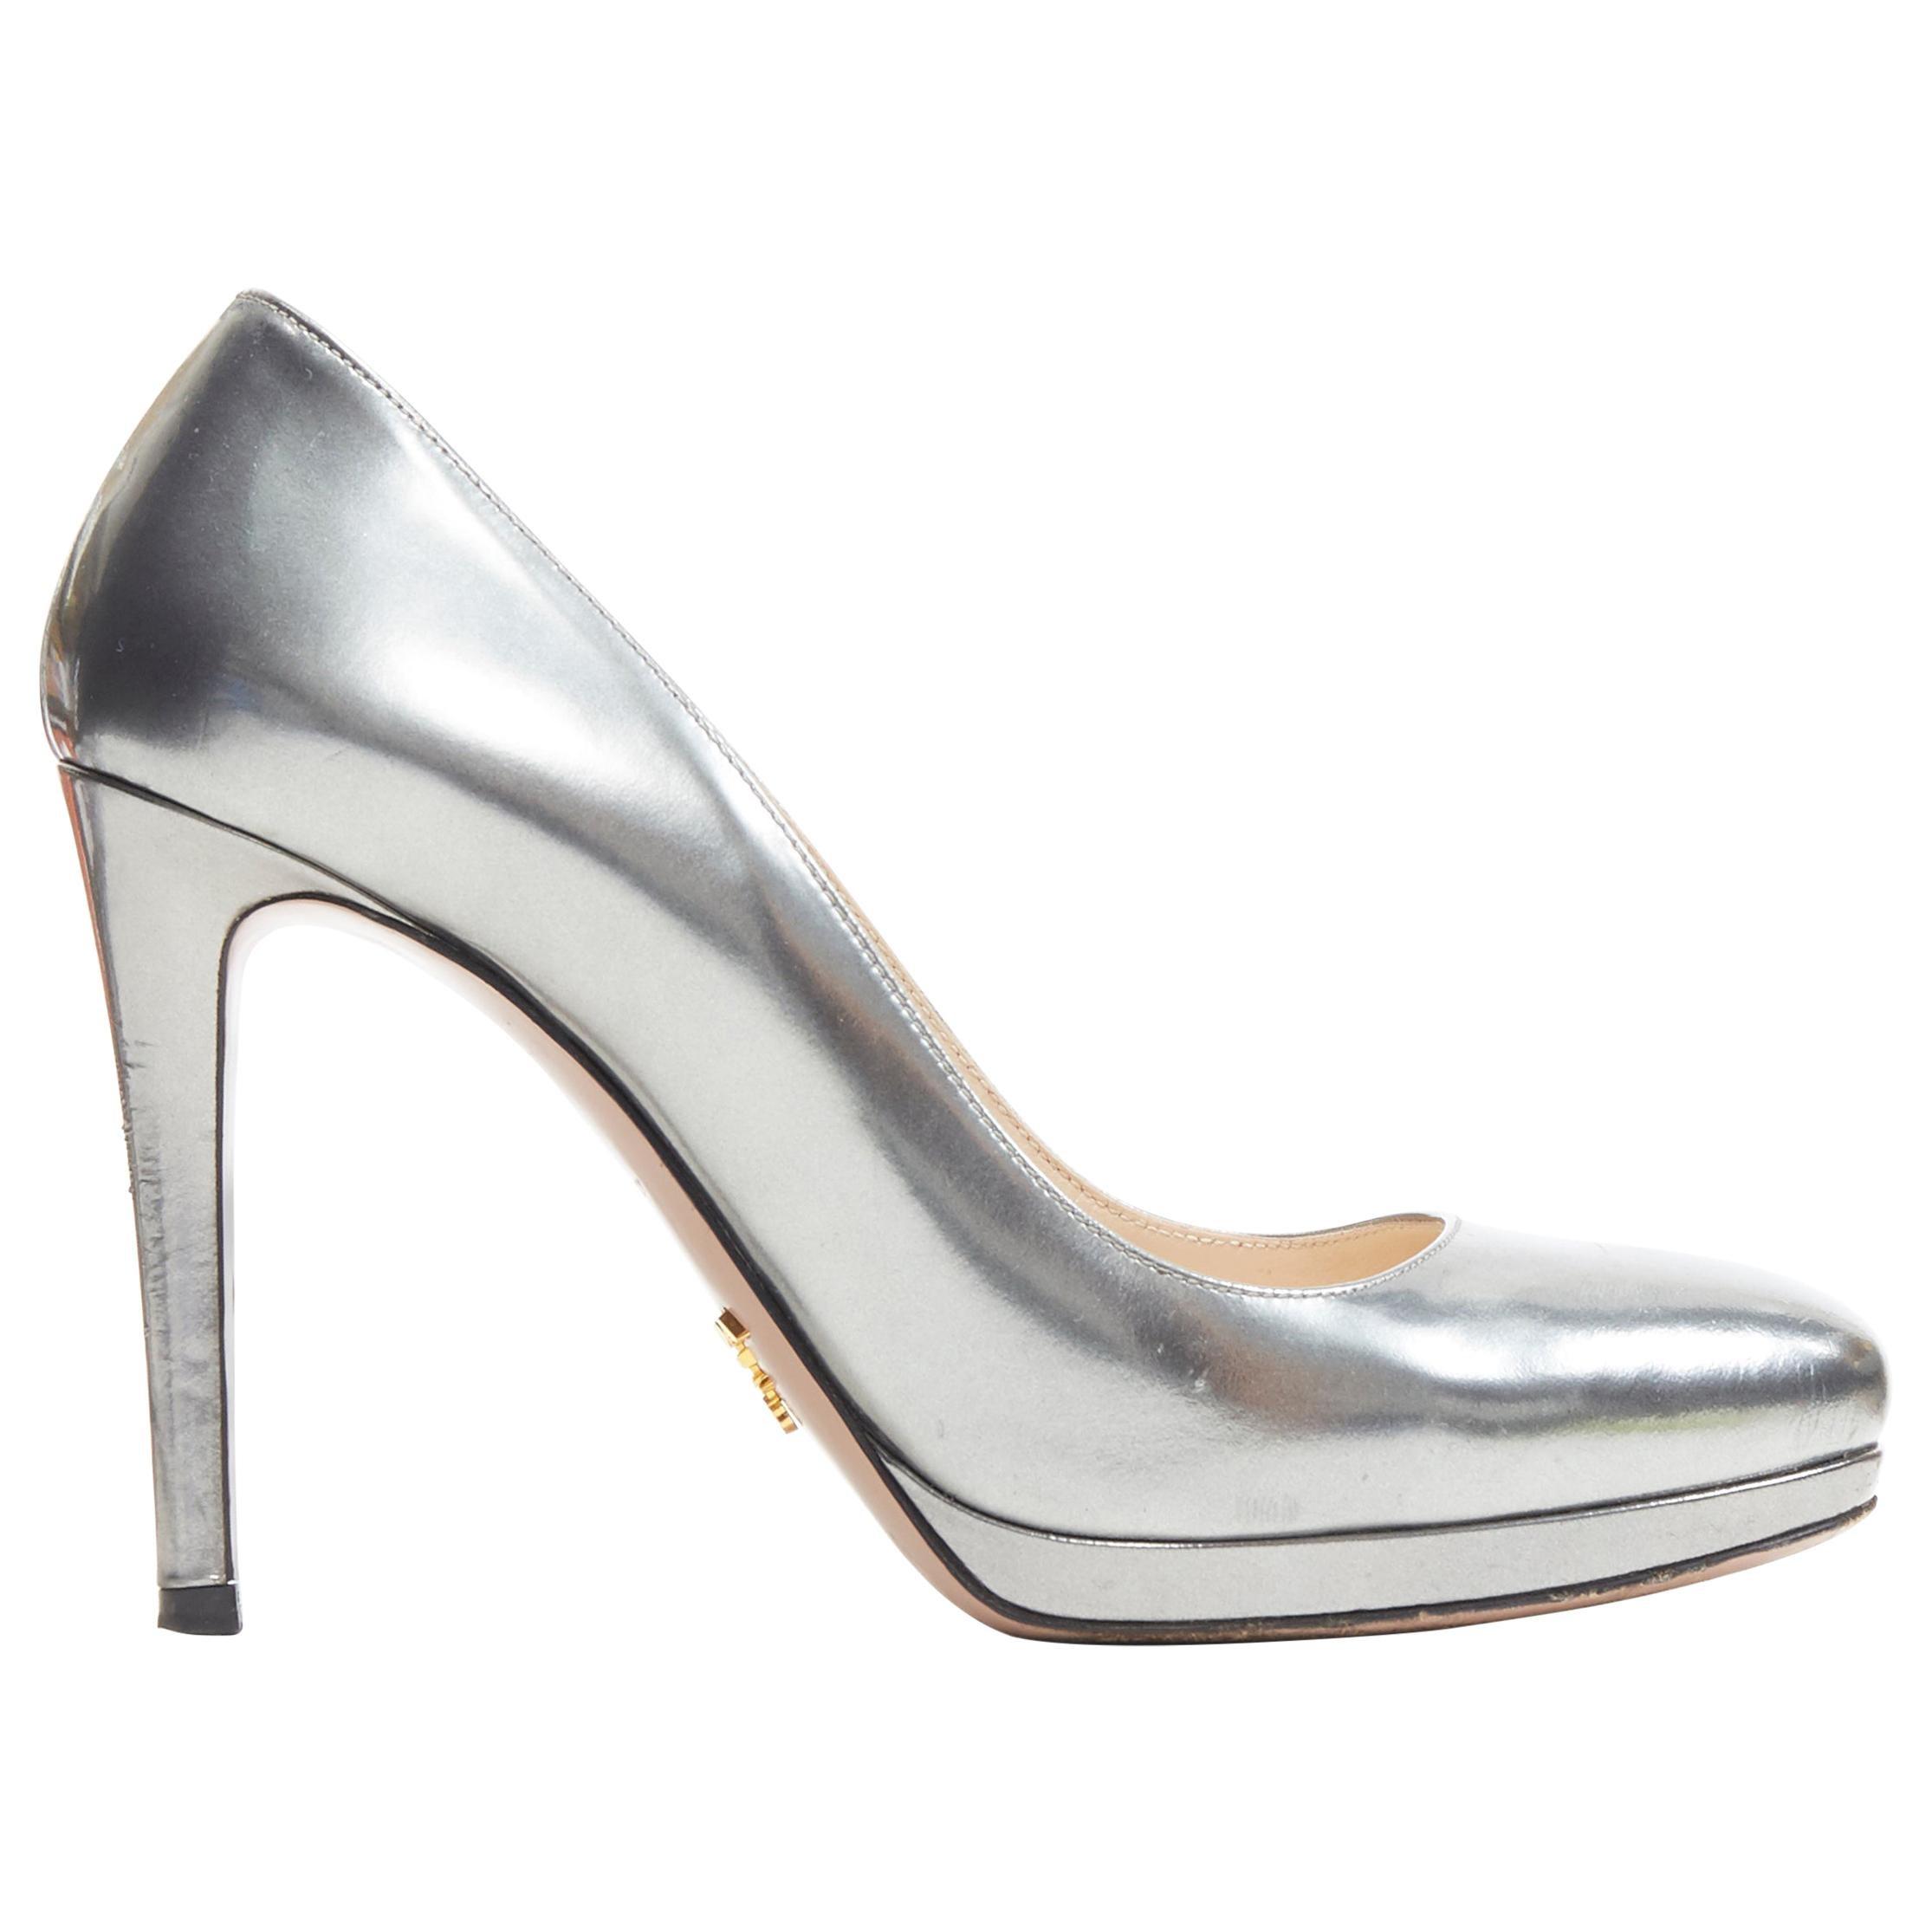 PRADA metallic mirrored silver leather round toe platform pump EU36